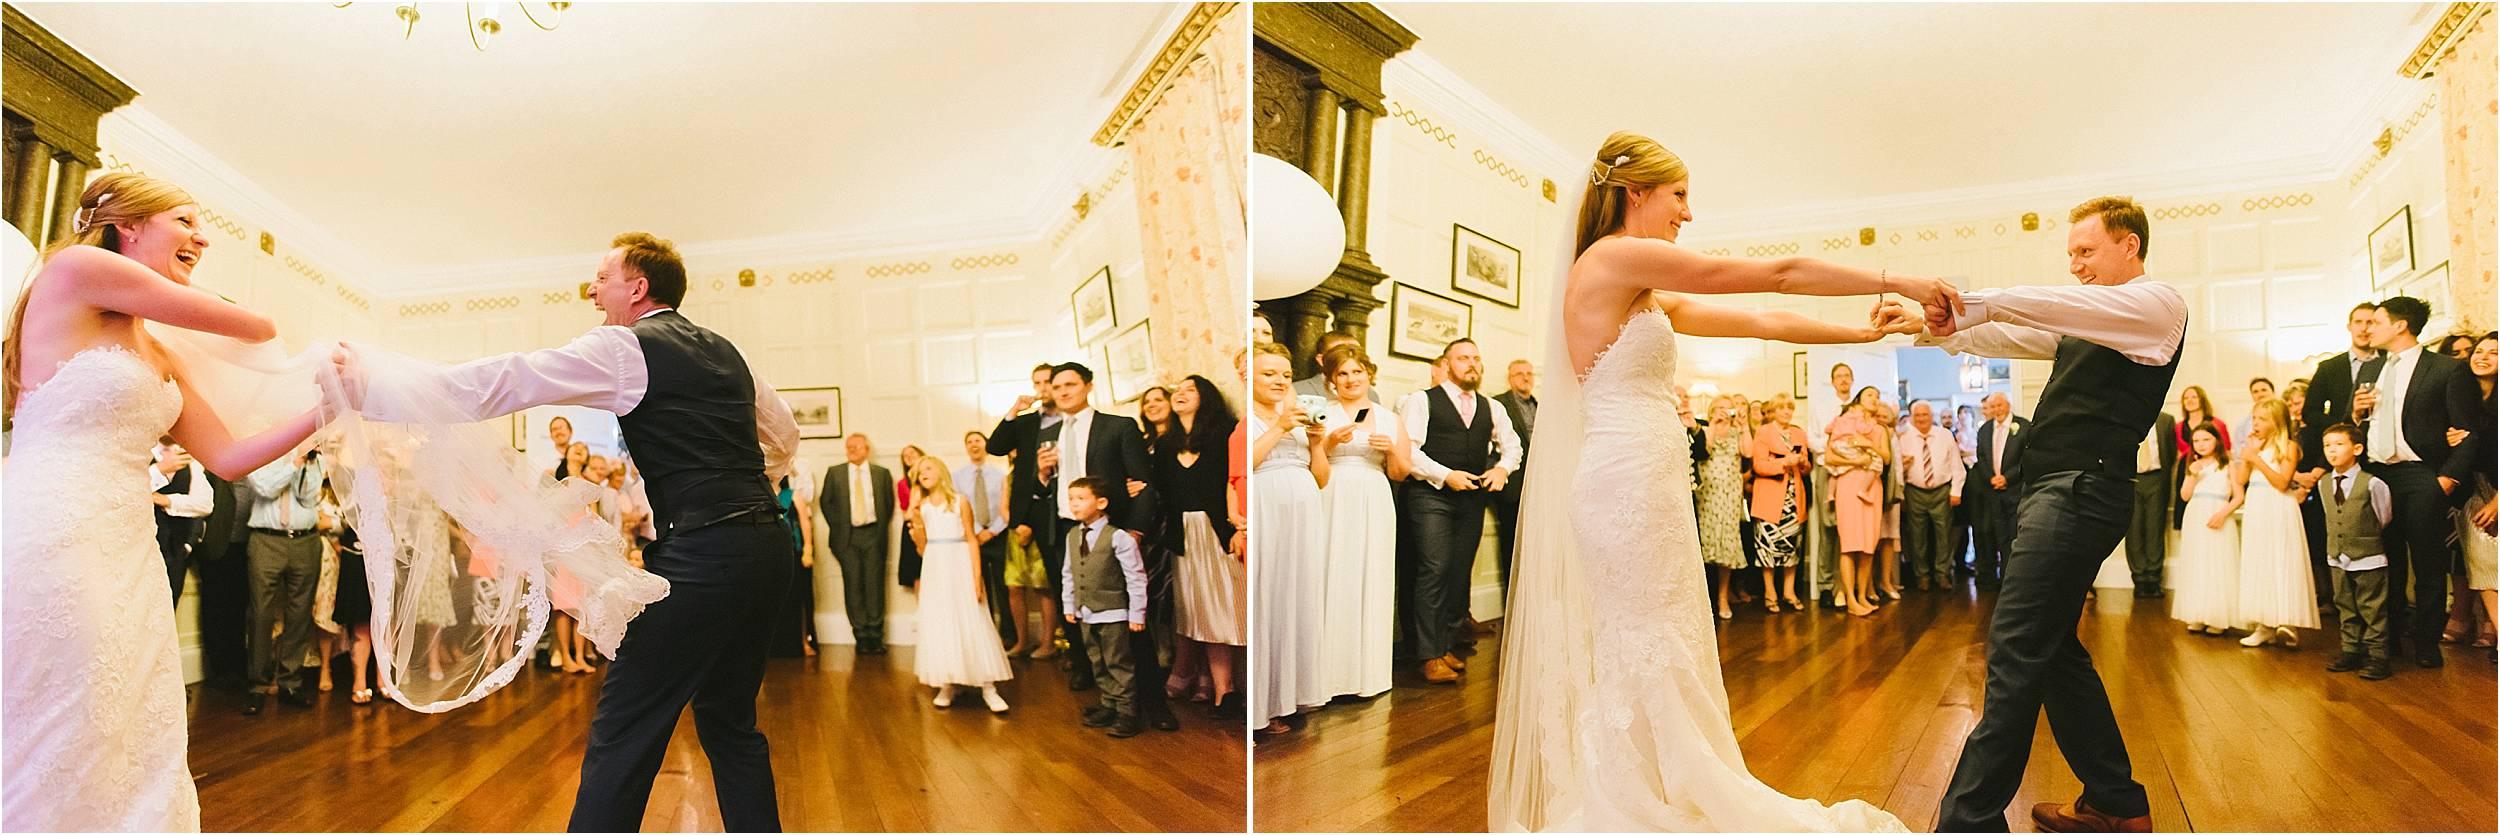 Herefordshire Wedding Photographer_0139.jpg